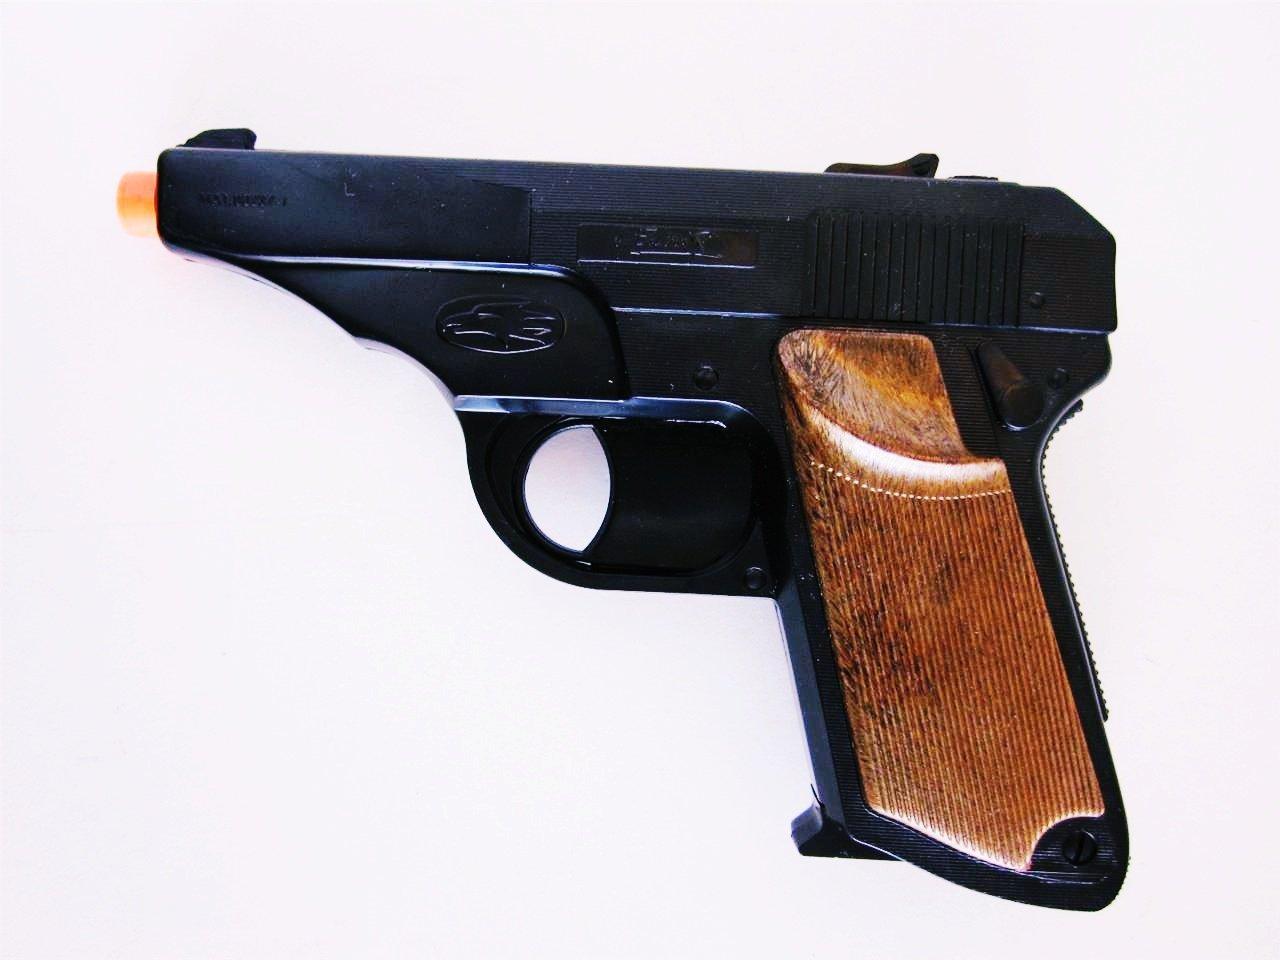 Amazon.com: WALTHER PPK James Bond Semi-Auto pistol Cap Gun hand replica  380 TOY Italy New For Ages 5+ Secret Agent Cap Gun: Toys & Games